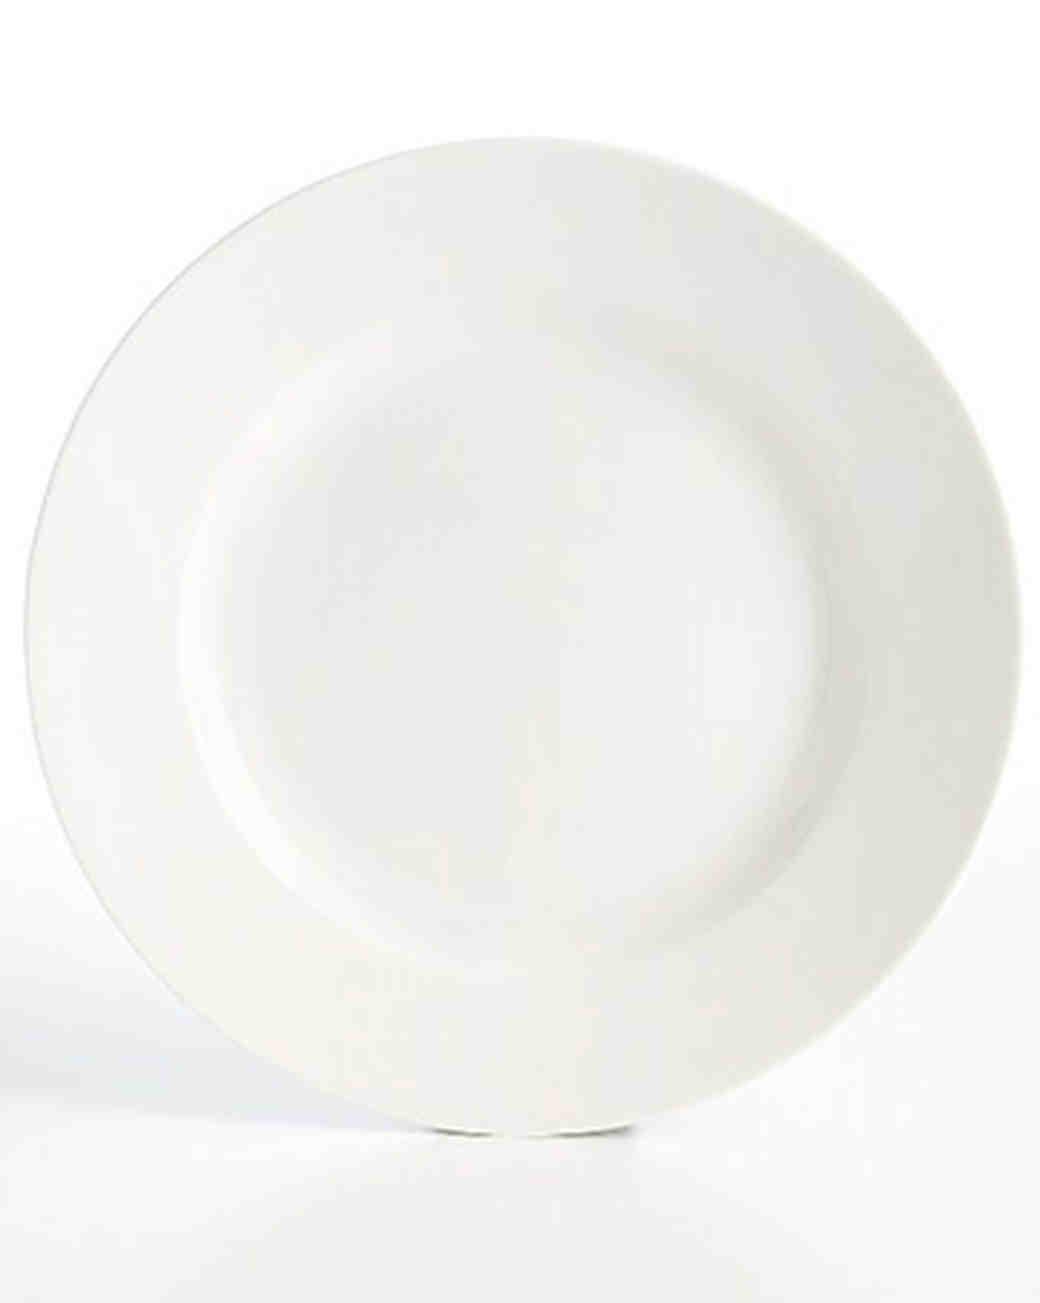 msw_sum10_kensington_dinner_plate.jpg